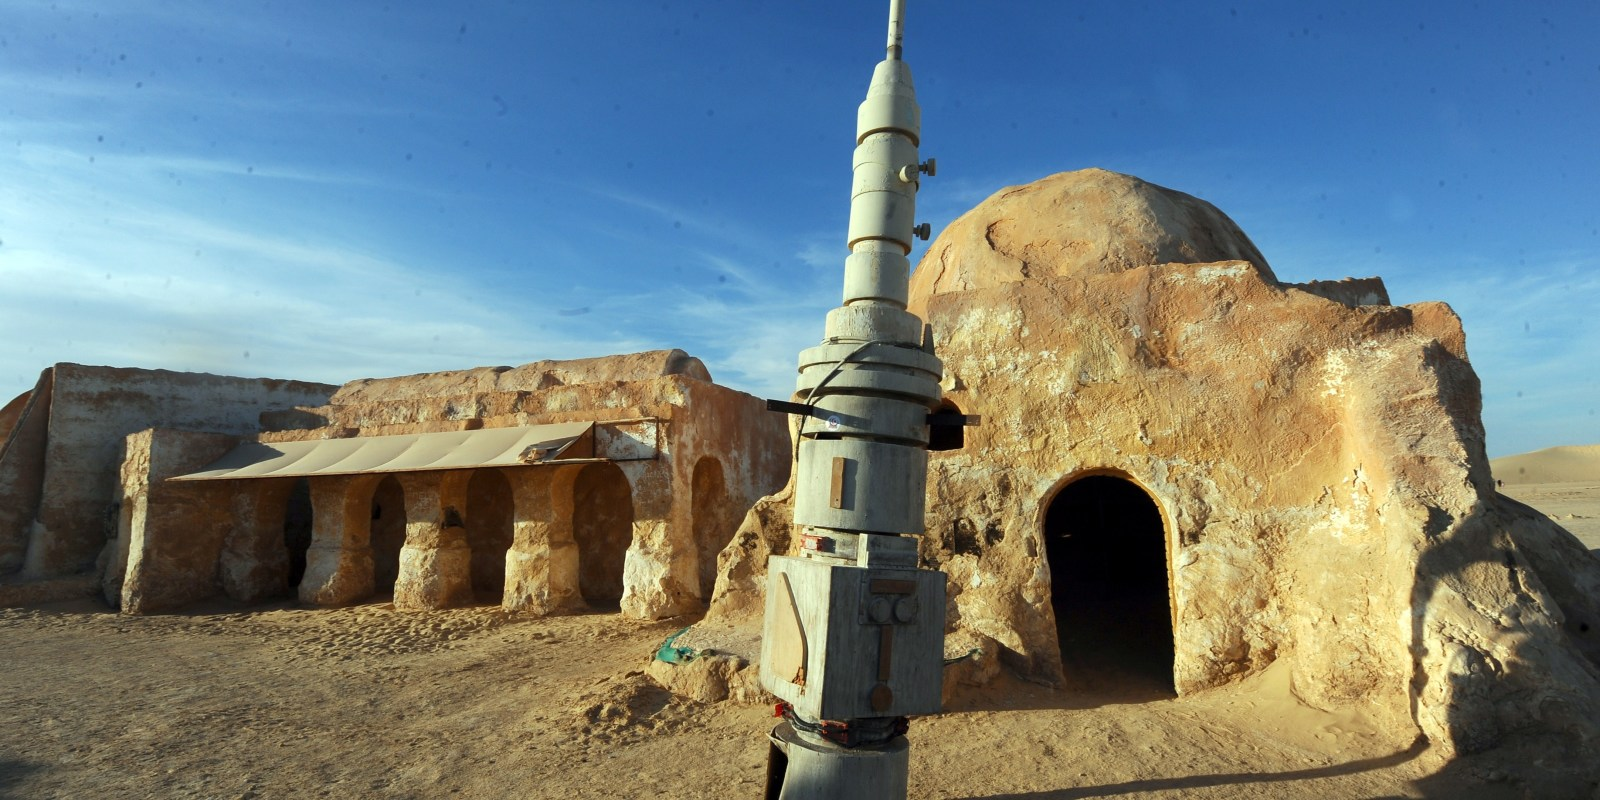 9. Tatooine, Star Wars 2